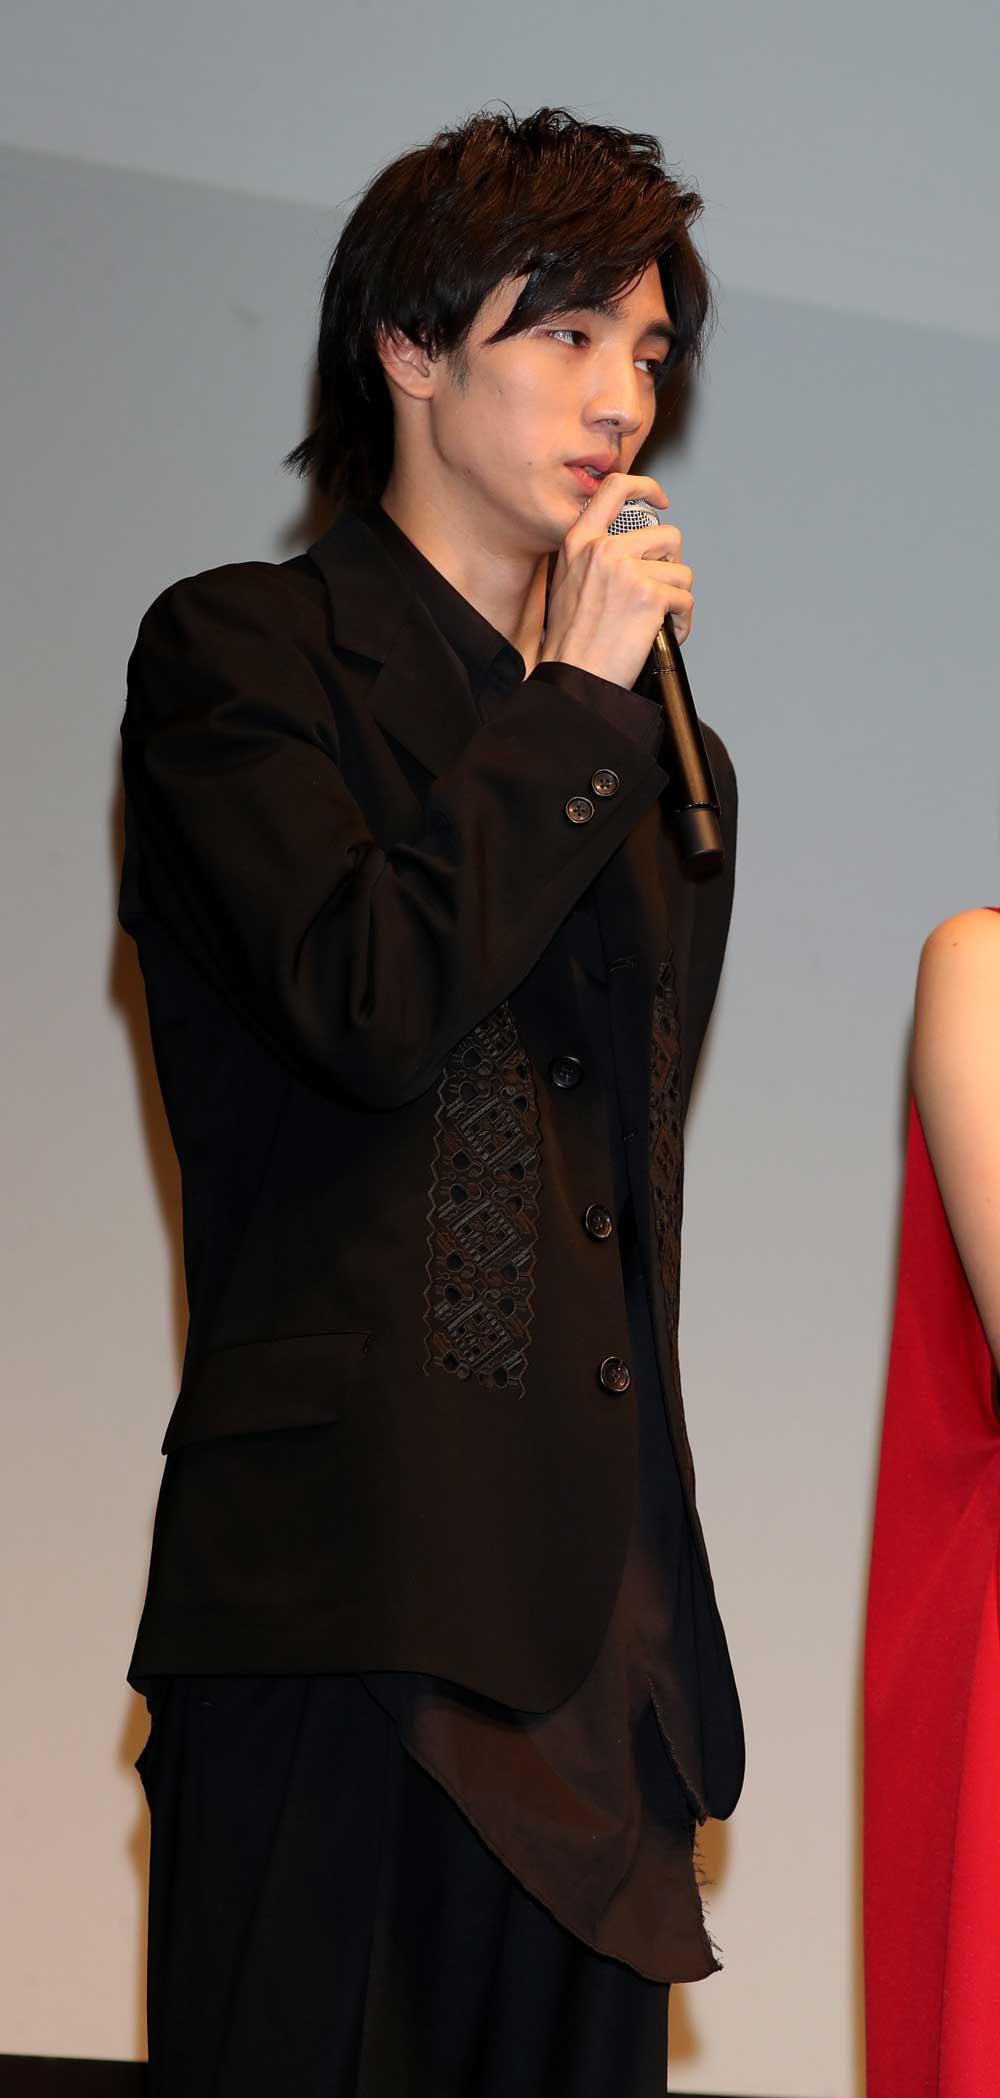 Images : 3番目の画像 - 「池田エライザ/5月24日公開の映画『貞子』の完成披露試写イベントに登場。「ただ怖い映画というわけでなくて、一味違う幽霊模様というか、人間模様が描かれています」」のアルバム - Stereo Sound ONLINE